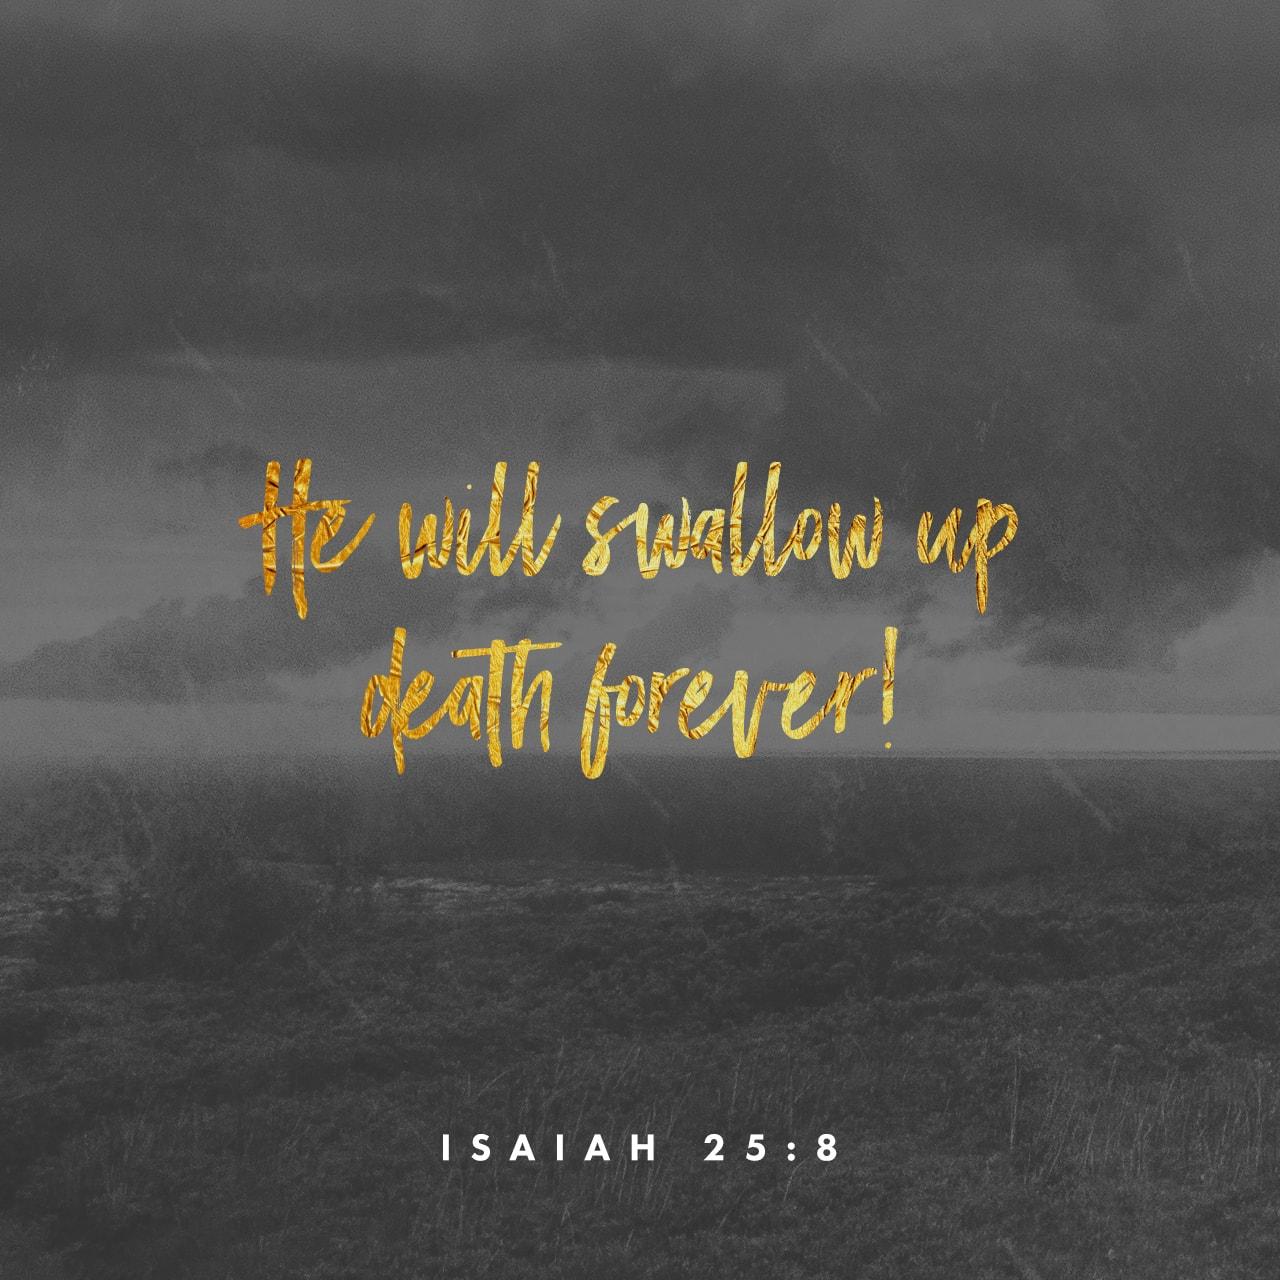 Isaiah 25:8